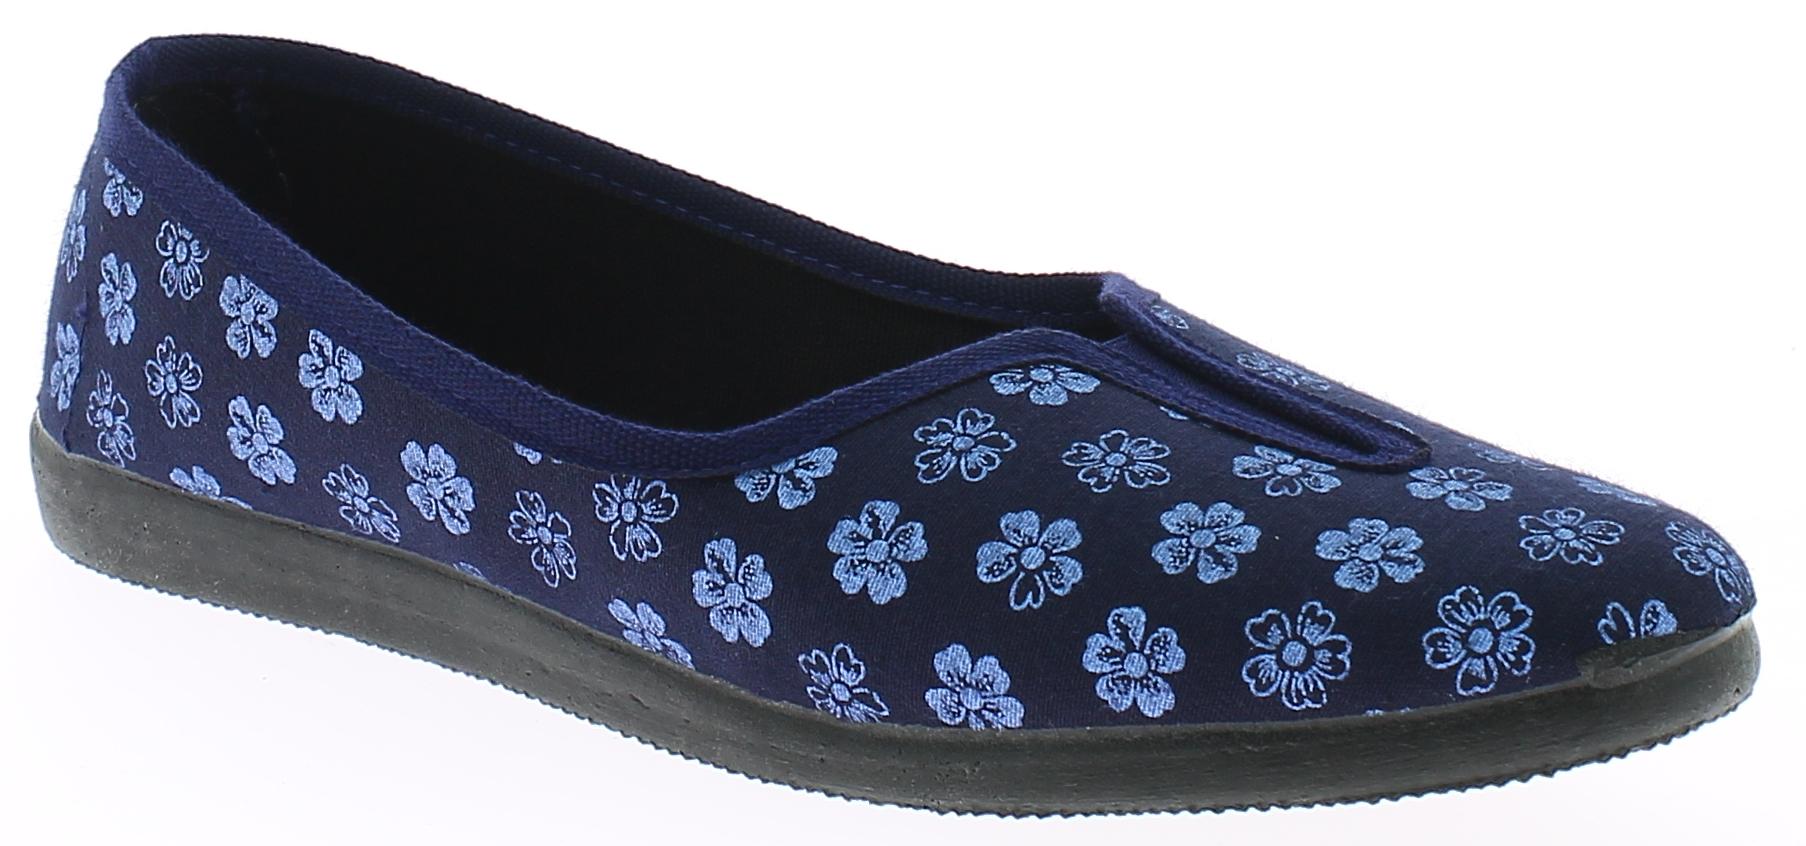 ANTRIN Γυναικεία Παντόφλα 35 Σιέλ - Μπλε - 35 SEIL-blue-36/4/10/81